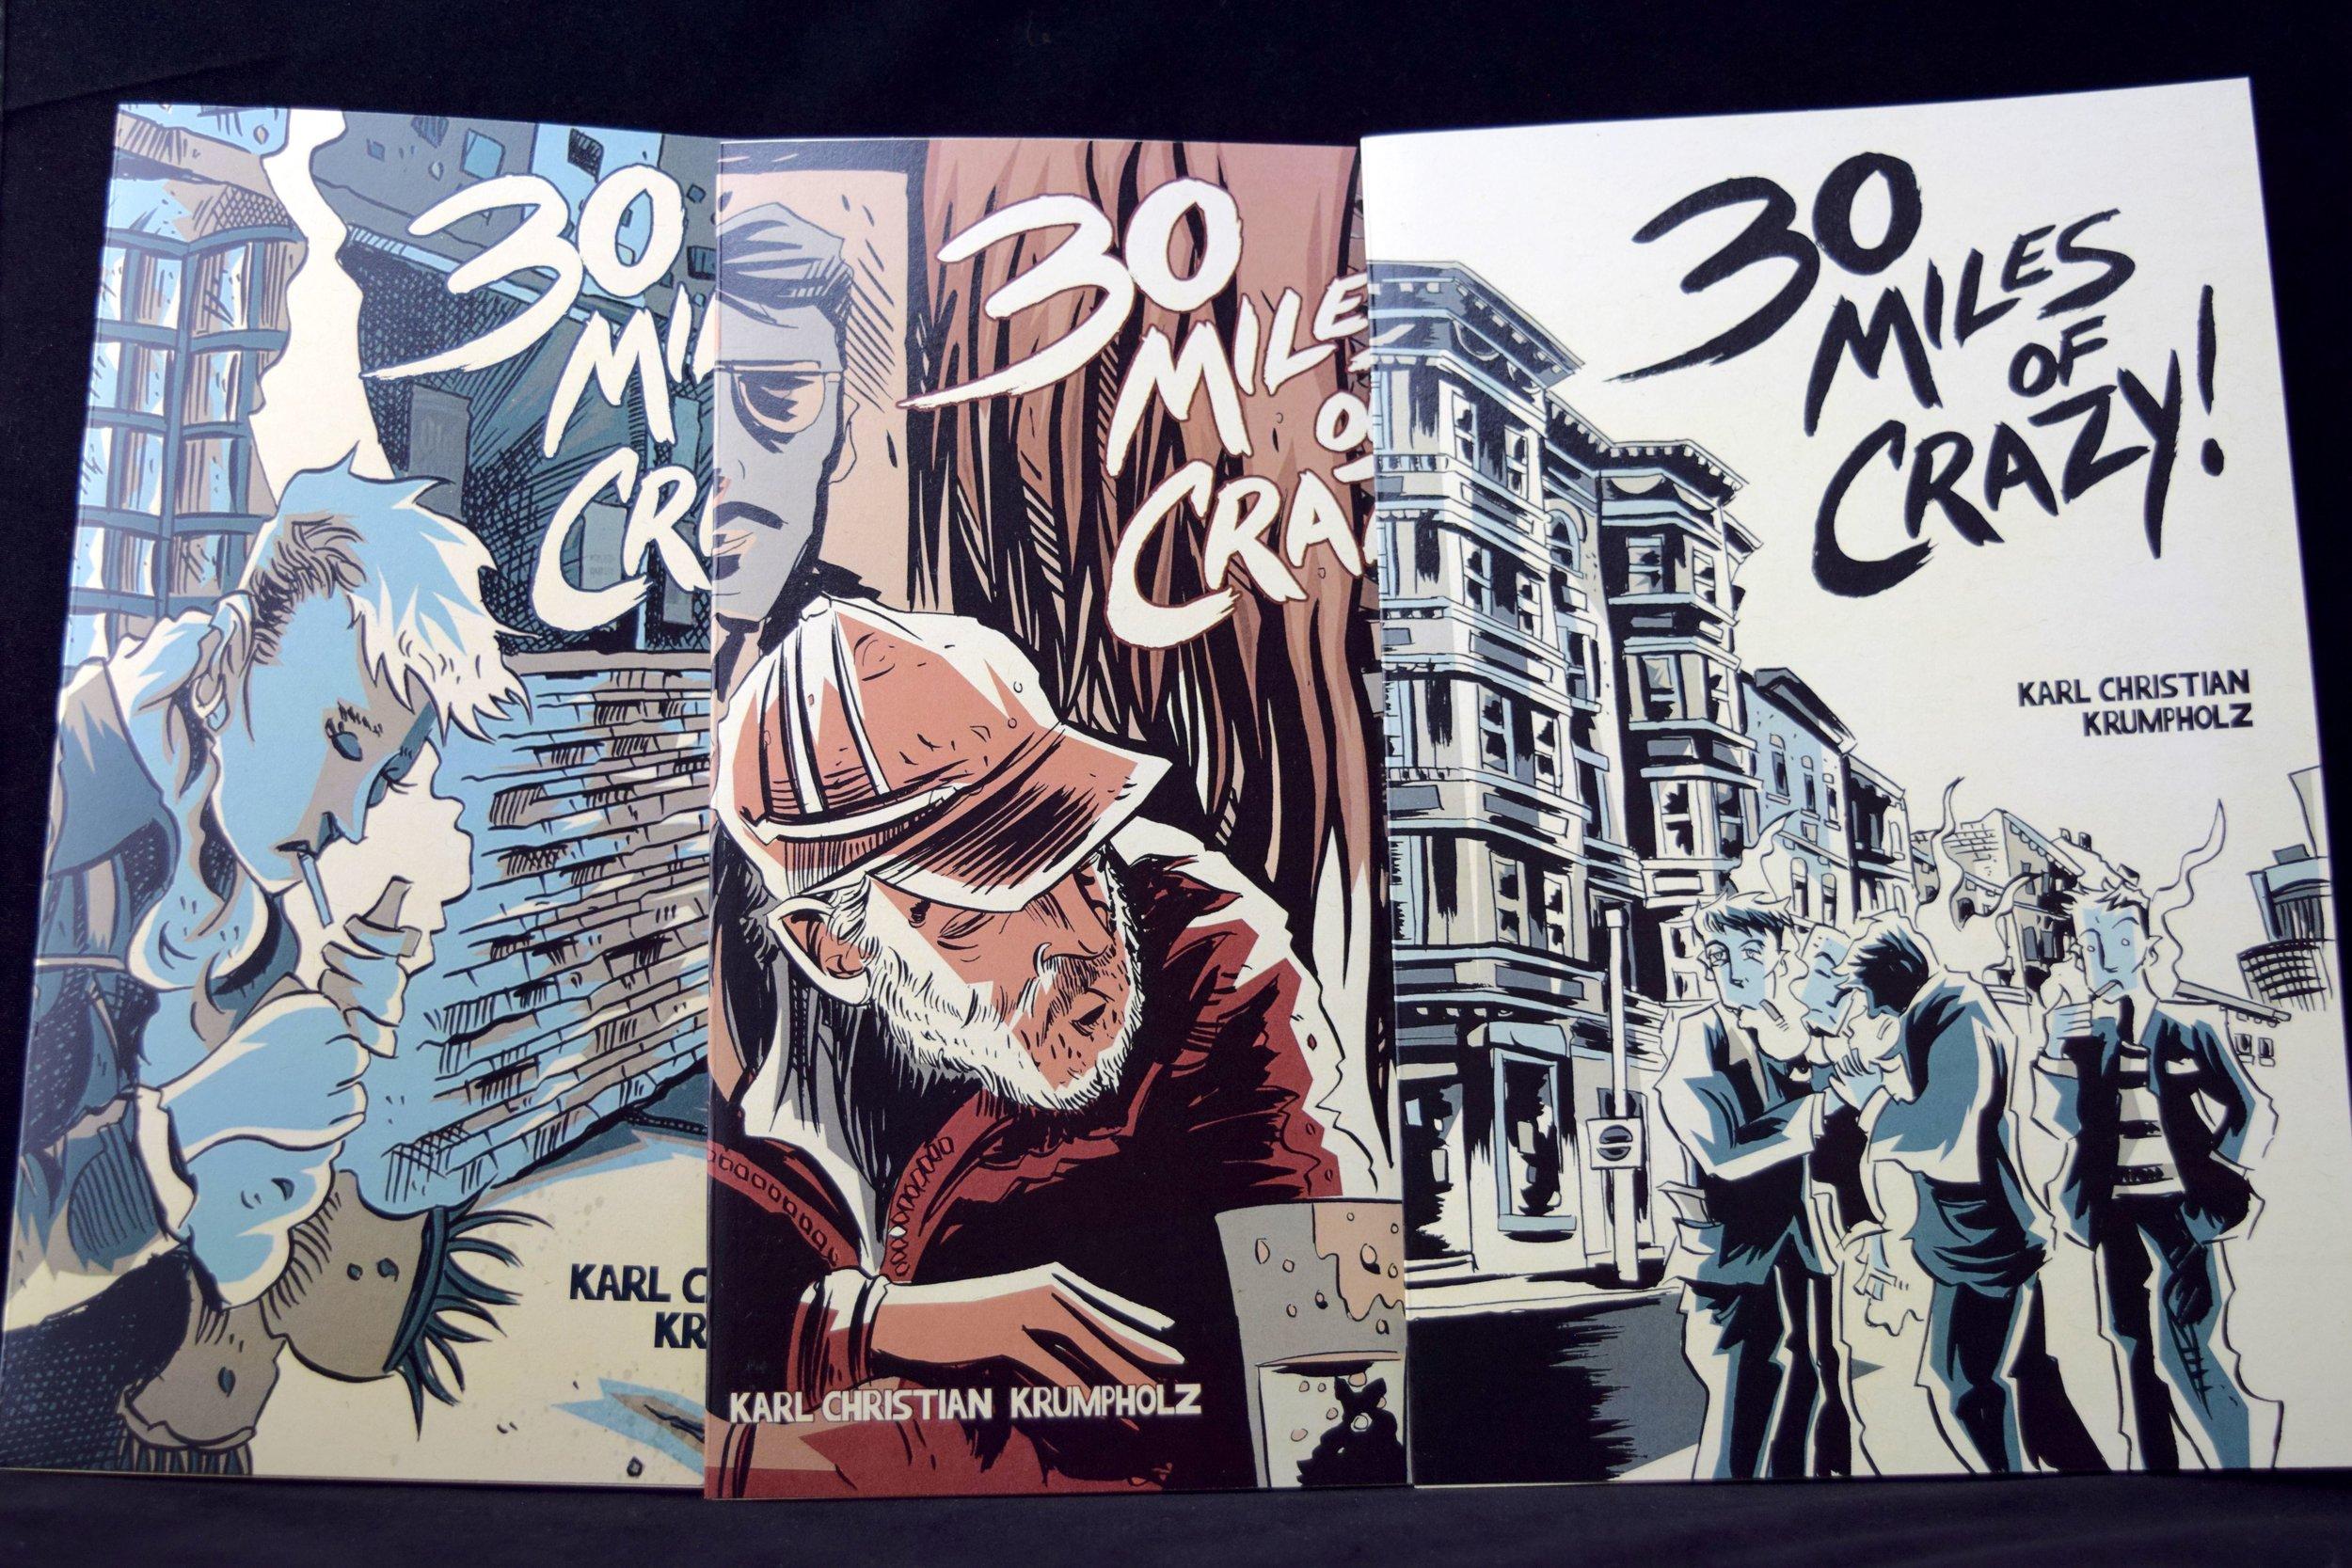 30 Miles of Crazy #1-3 by Karl Christian Krumpholz, premiering at DINK 2018.